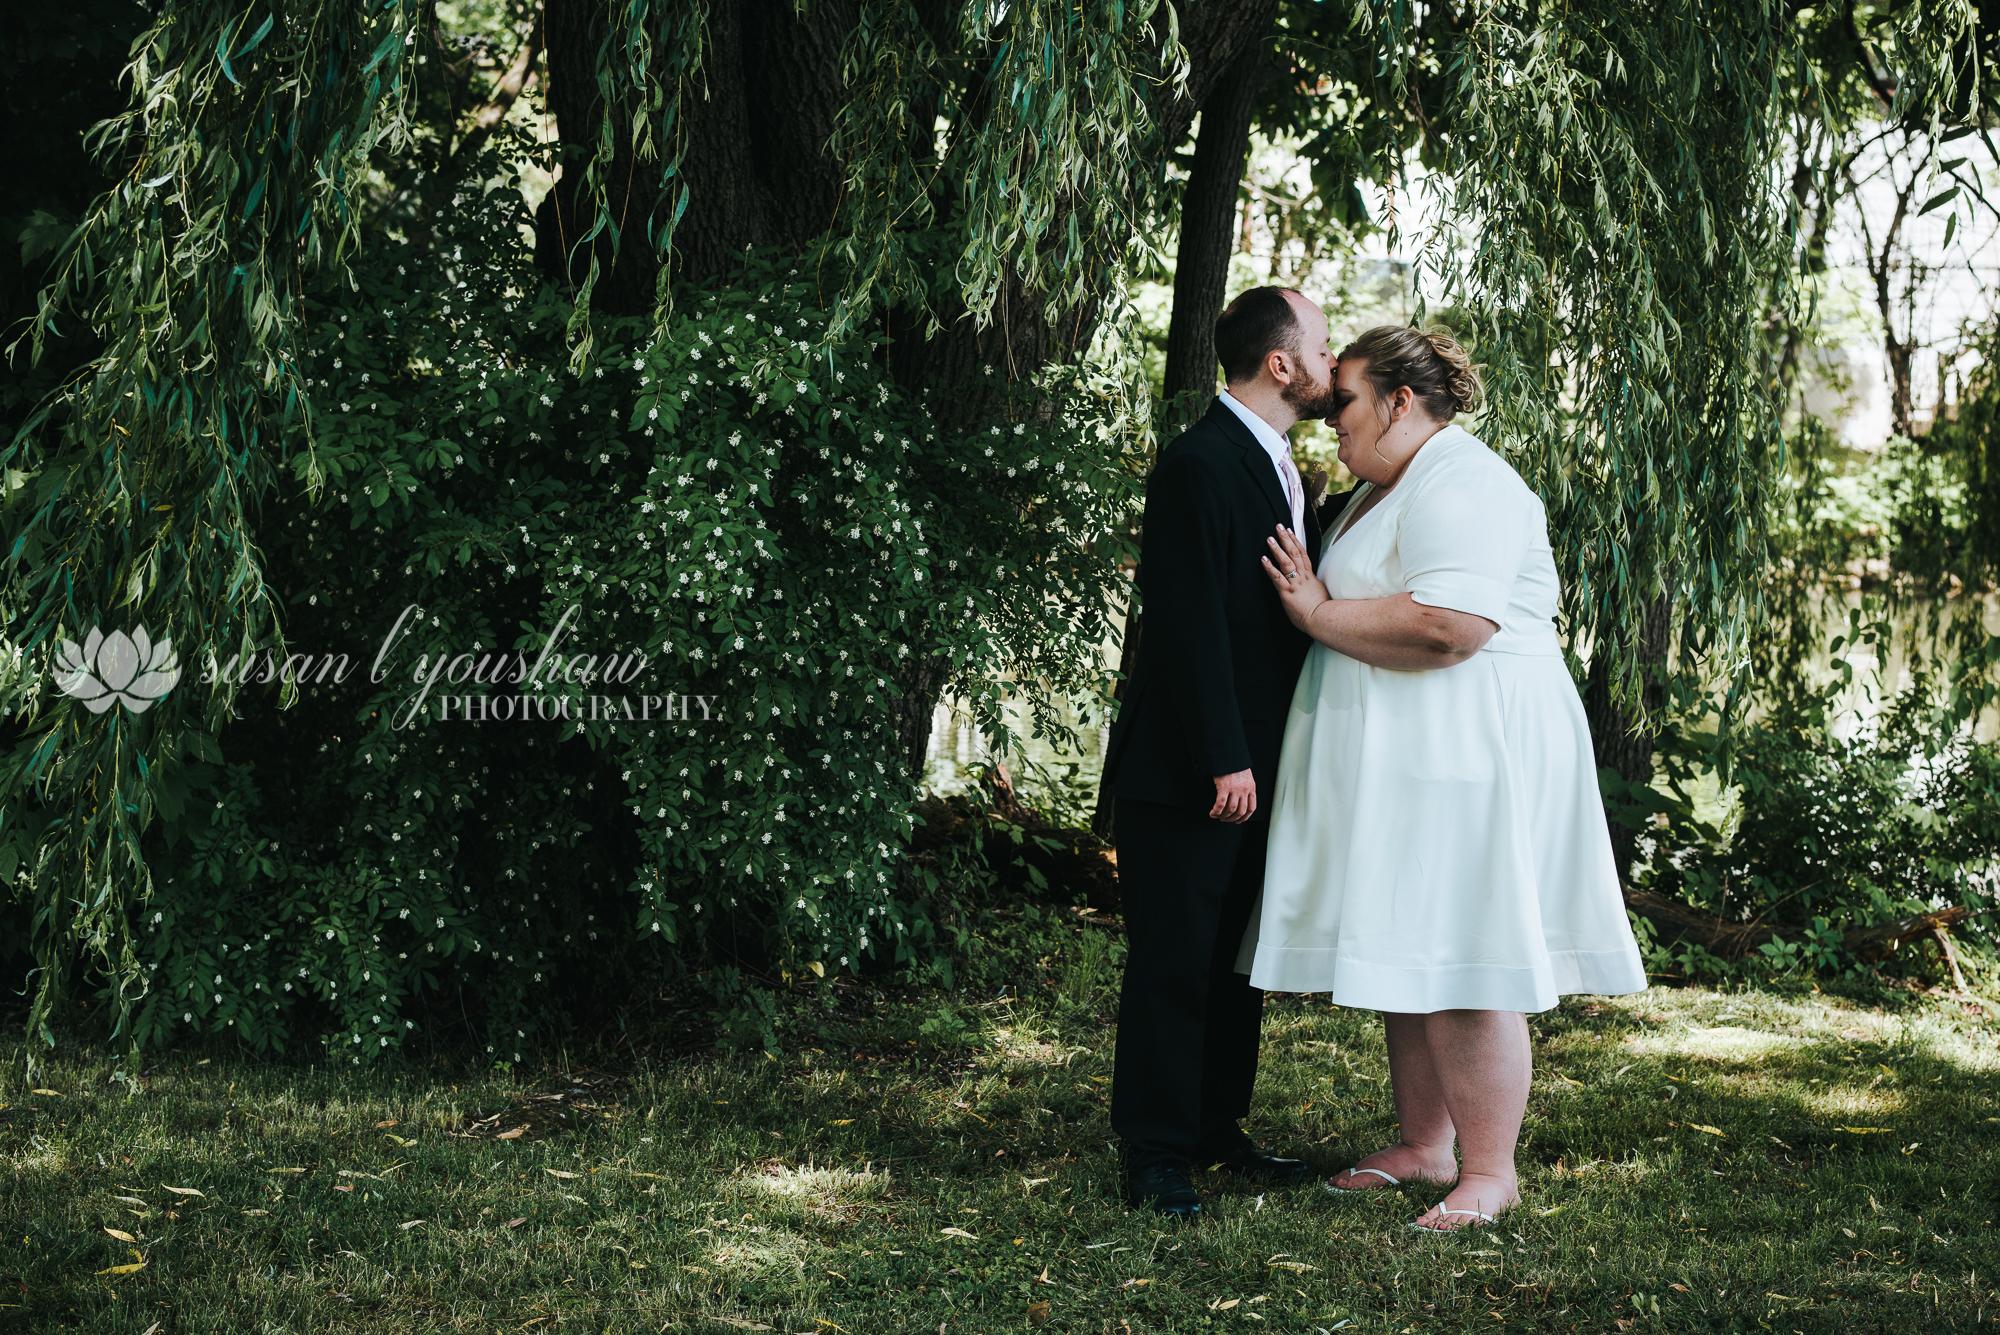 Bill and Sarah Wedding Photos 06-08-2019 SLY Photography -64.jpg